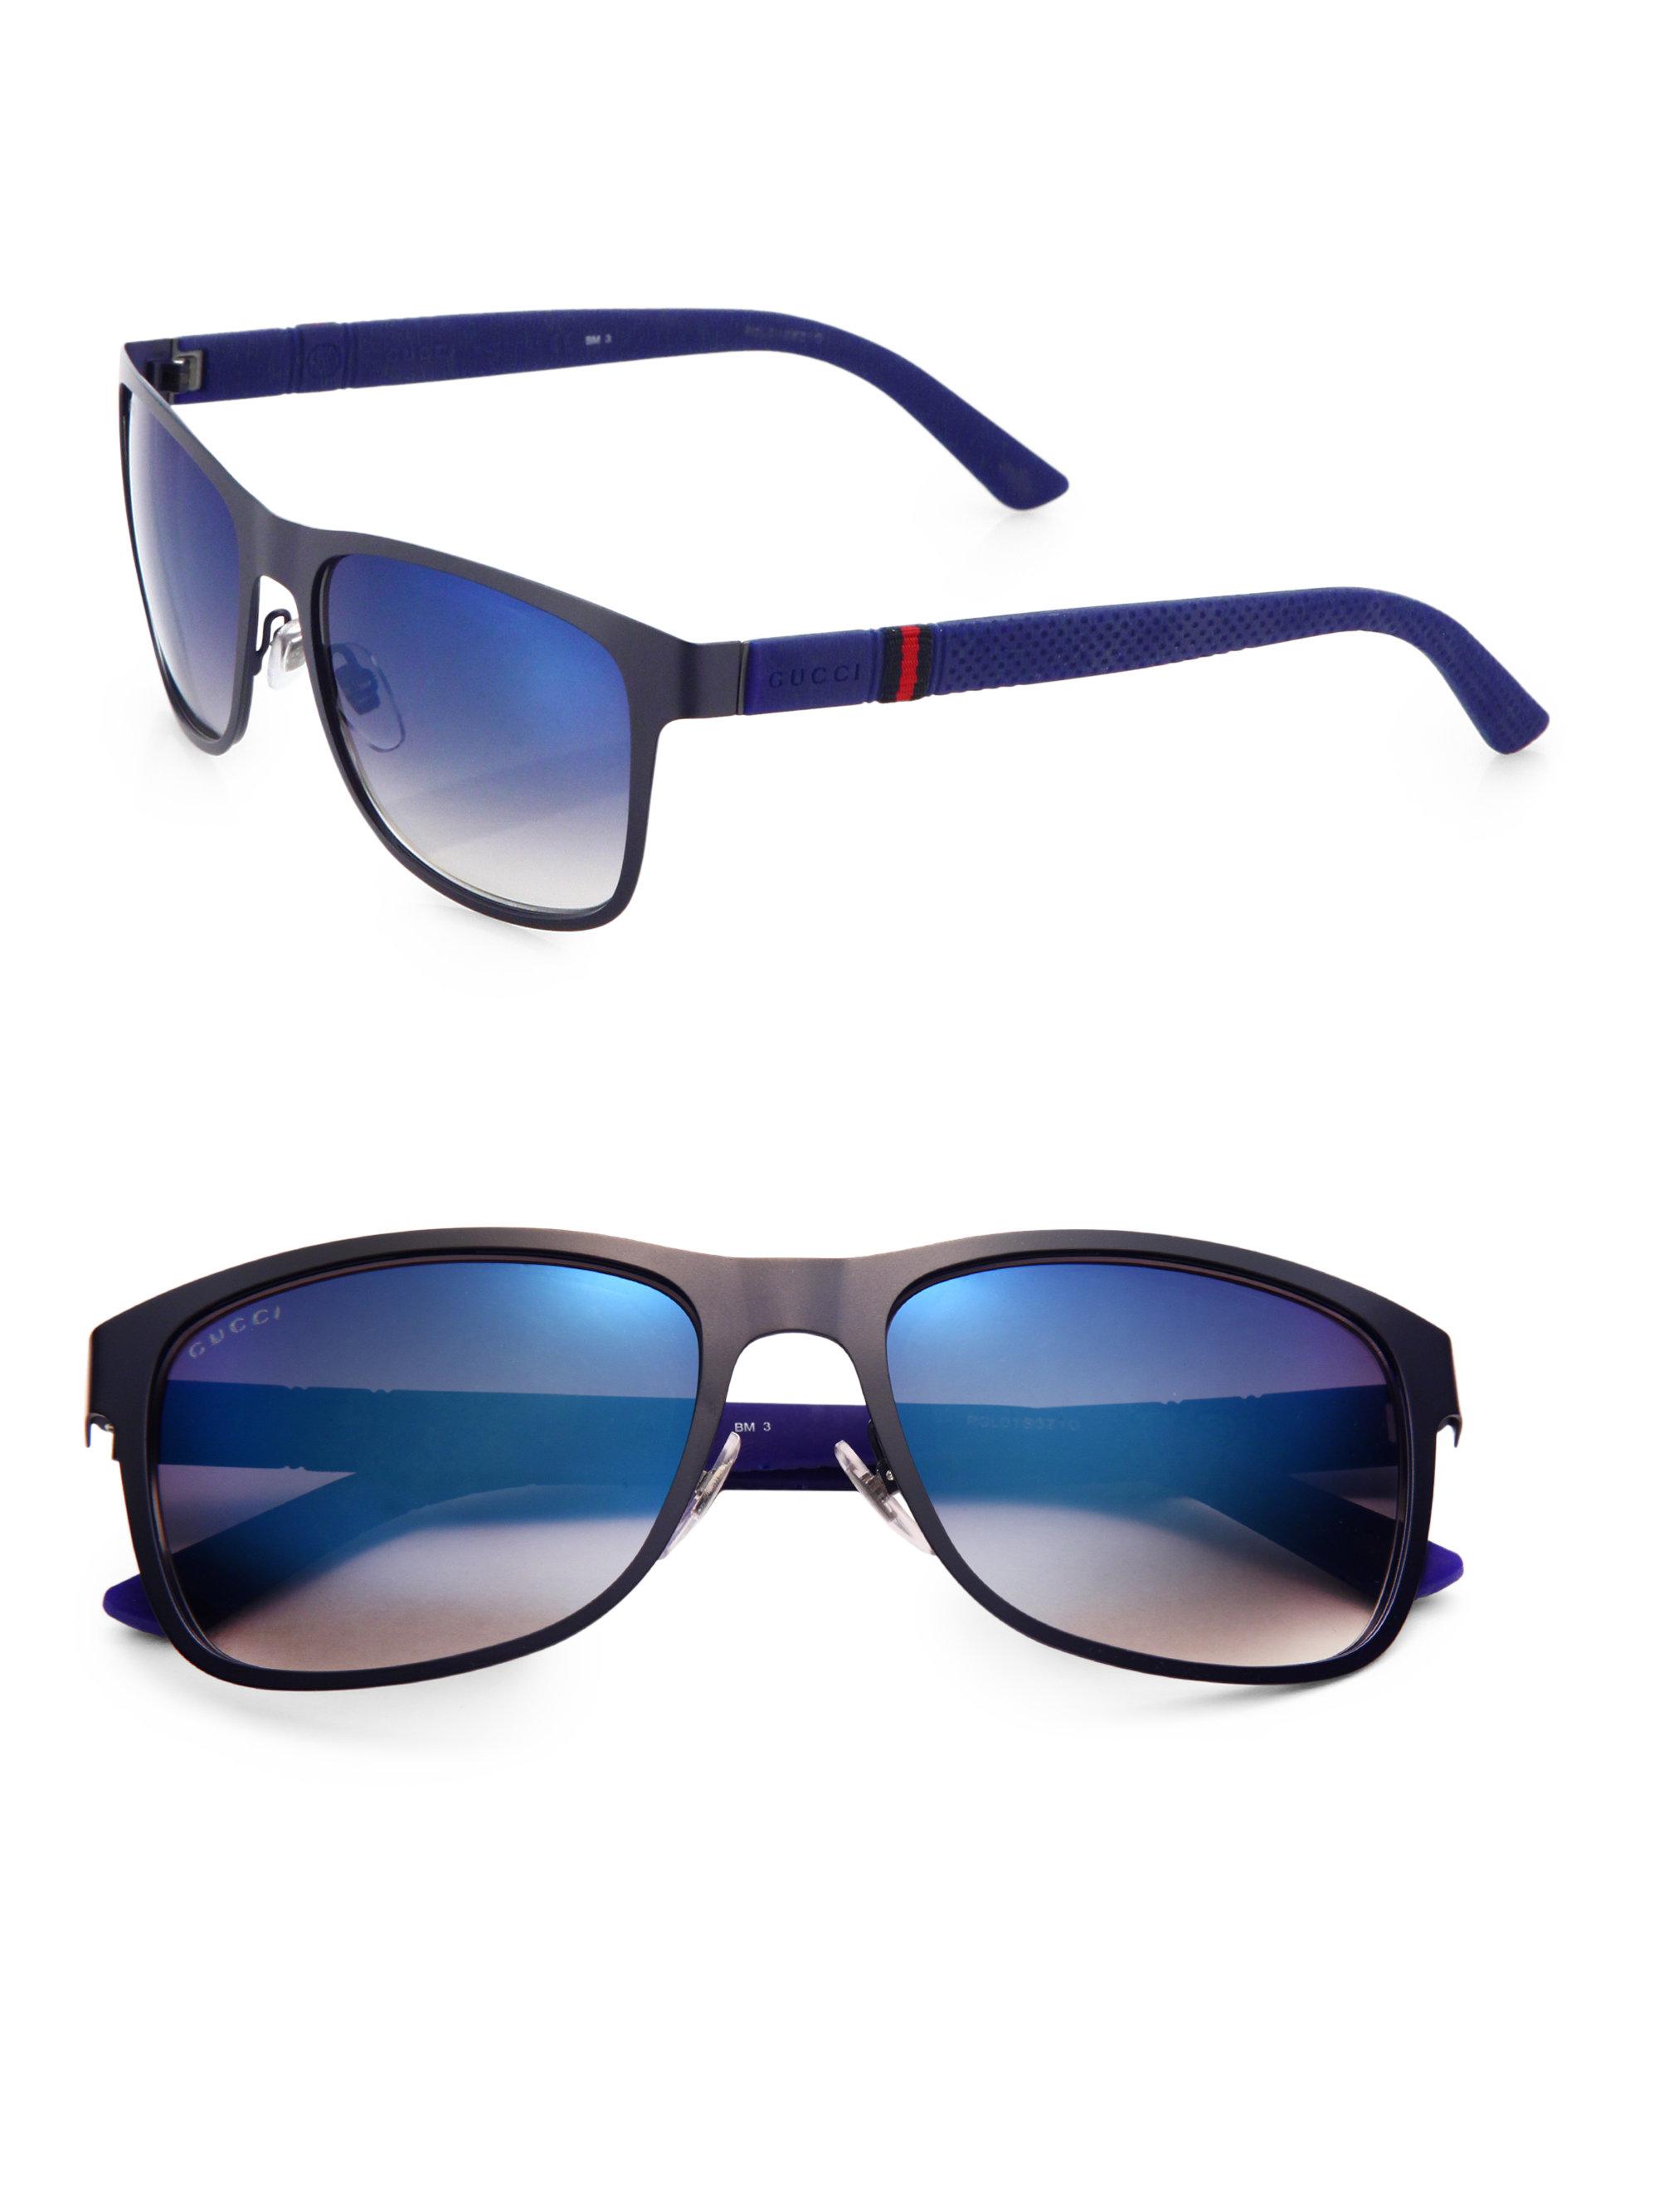 Lyst - Gucci 56mm Wayfarer Sunglasses in Blue for Men ddfd43fa8